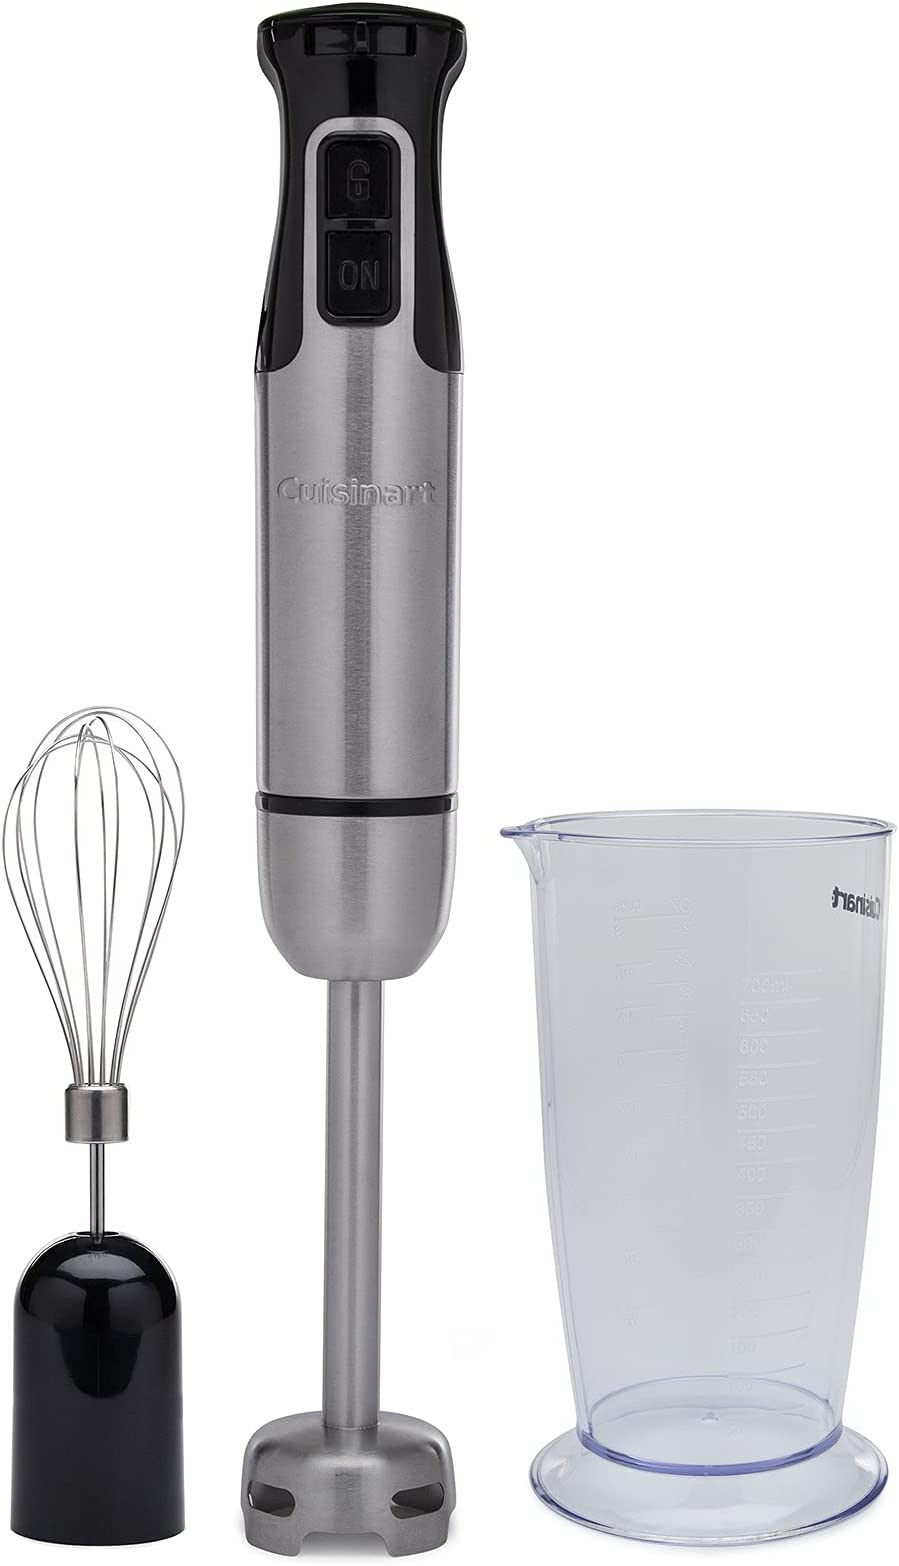 Cuisinart Smart Stick Variable Speed Hand Blender (Renewed)